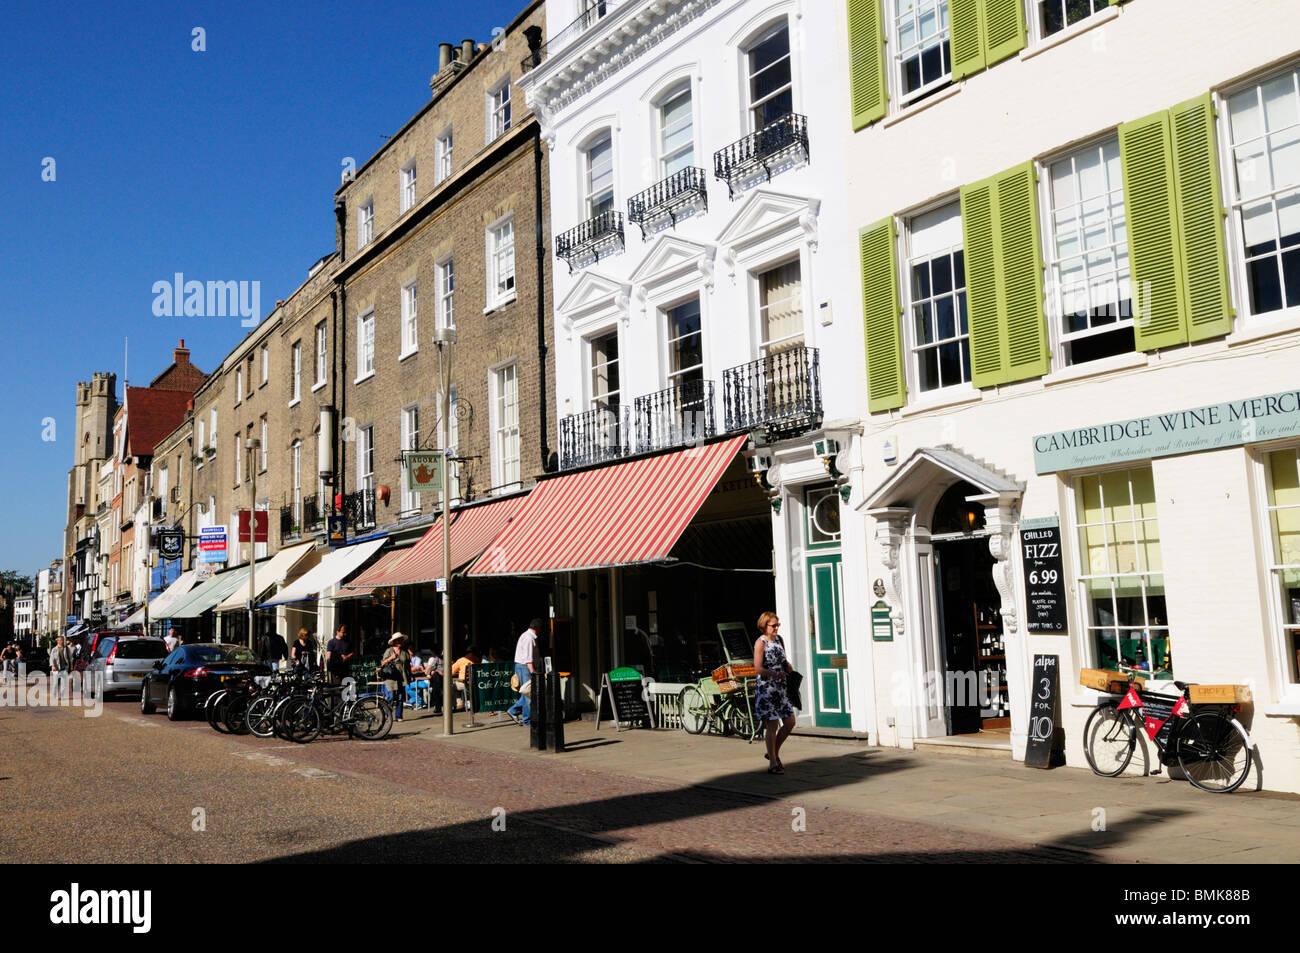 Shops along Kings Parade, Cambridge, England, UK - Stock Image